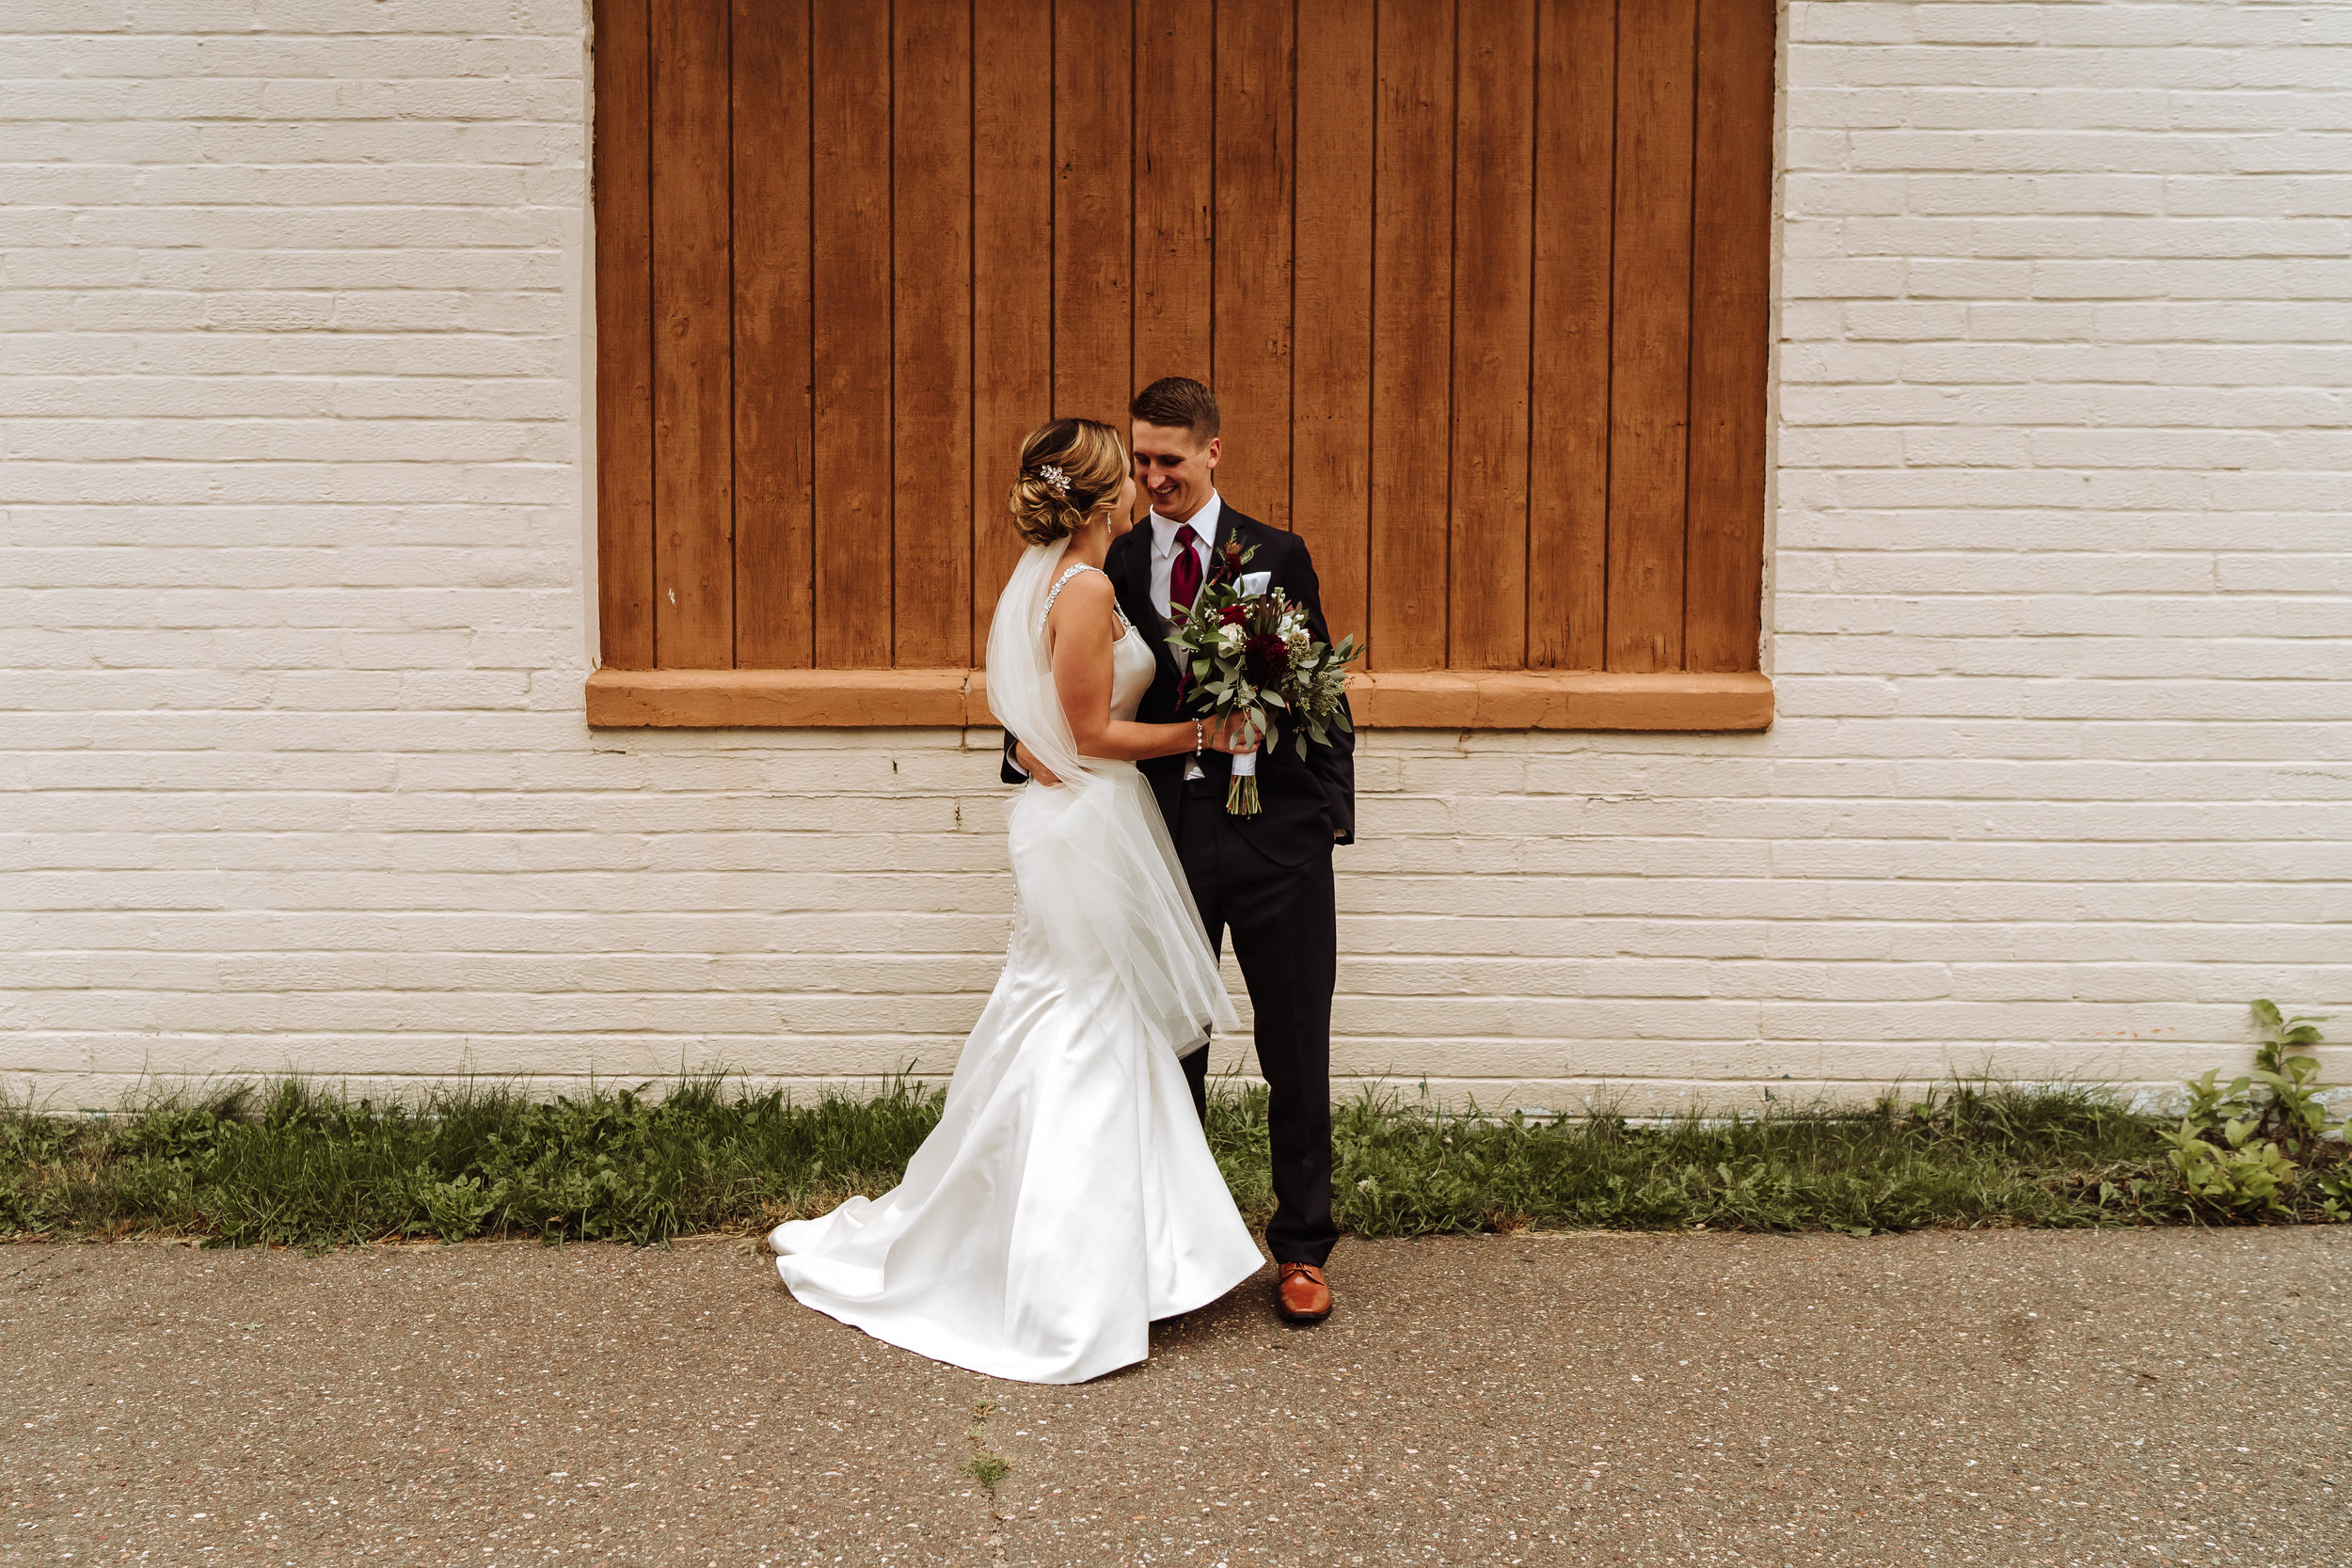 Scott and Andrea Wedding 2018-152.jpg